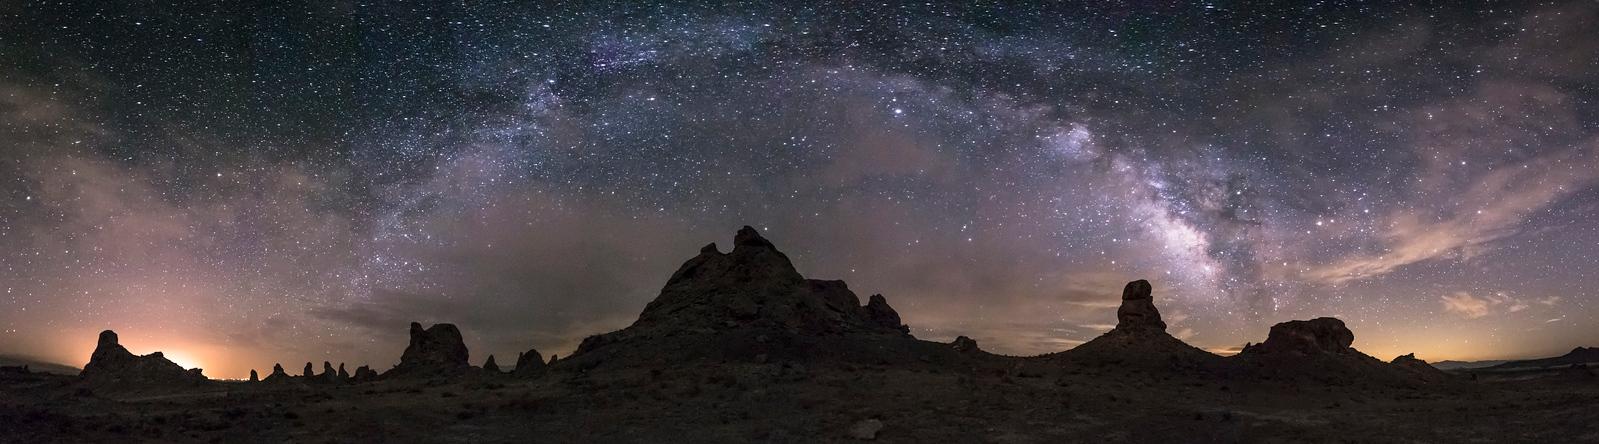 Partly Cloudy Milky Way Panorama at the Trona Pinnacles